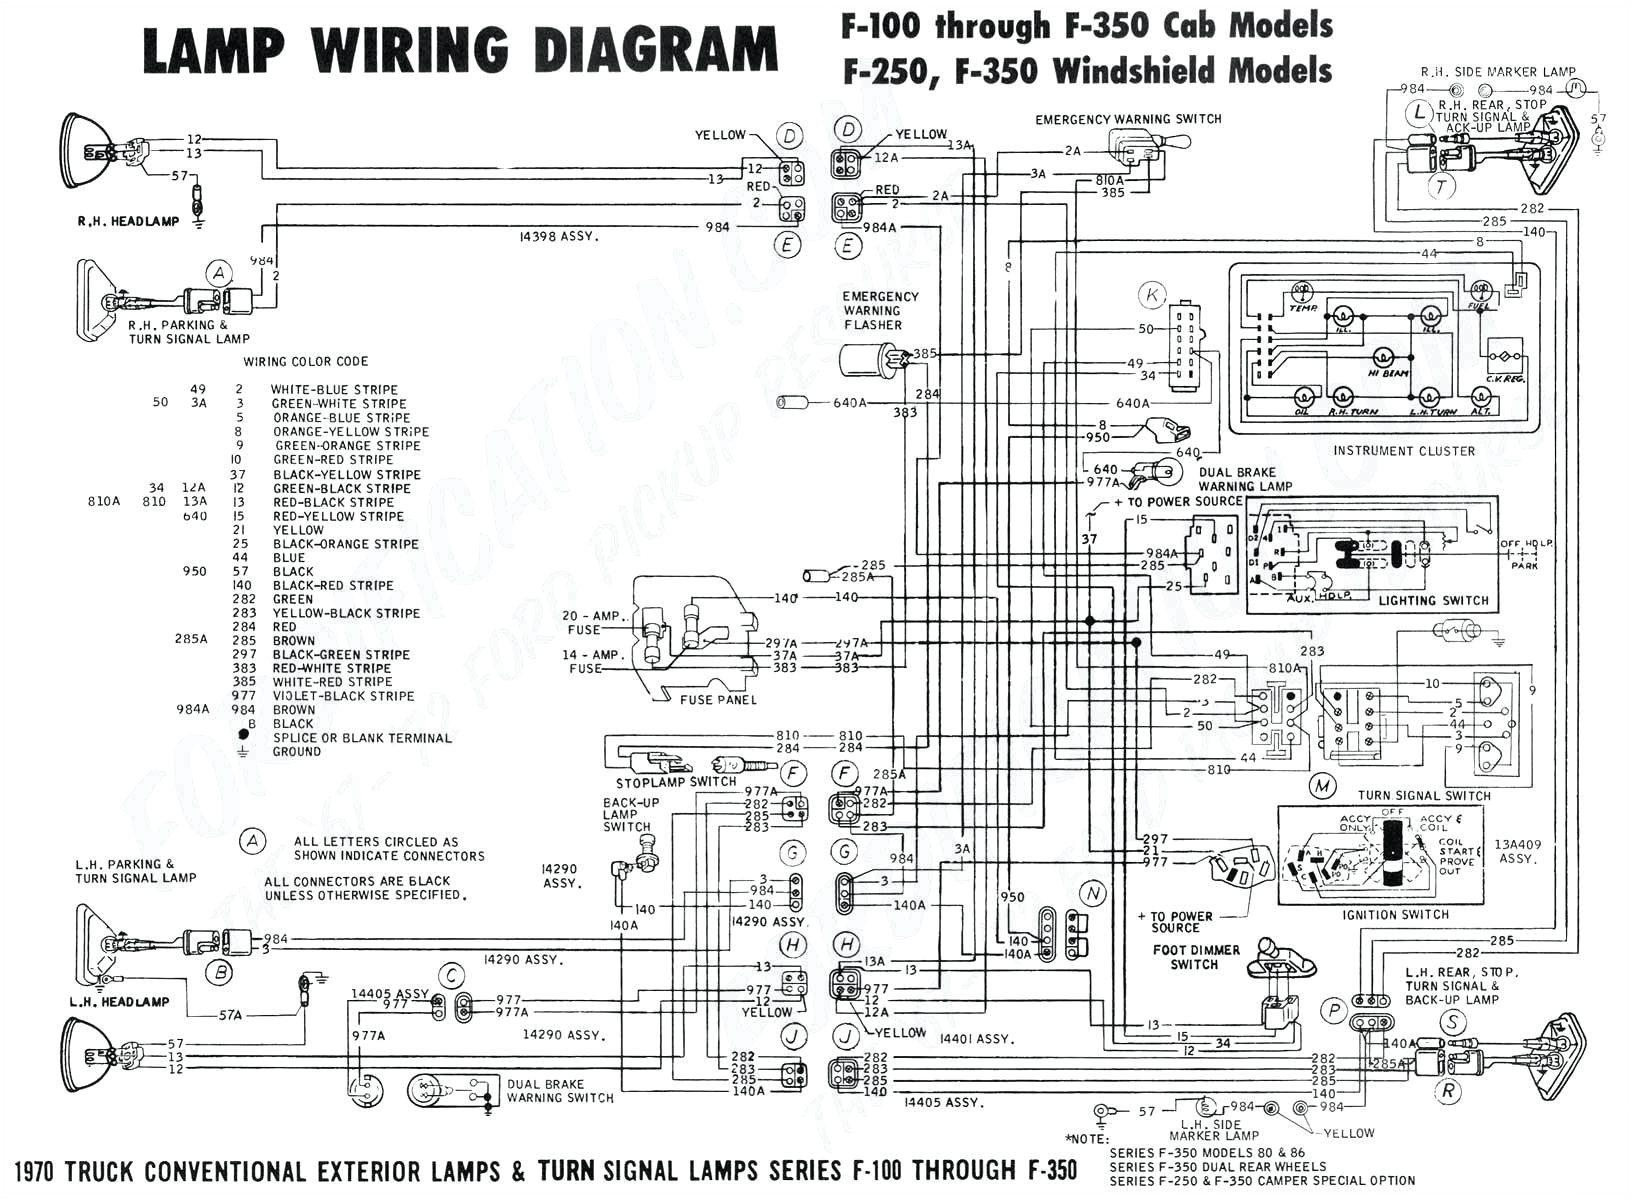 wiring diagram for 1995 jeep grand cherokee wiring diagram schema